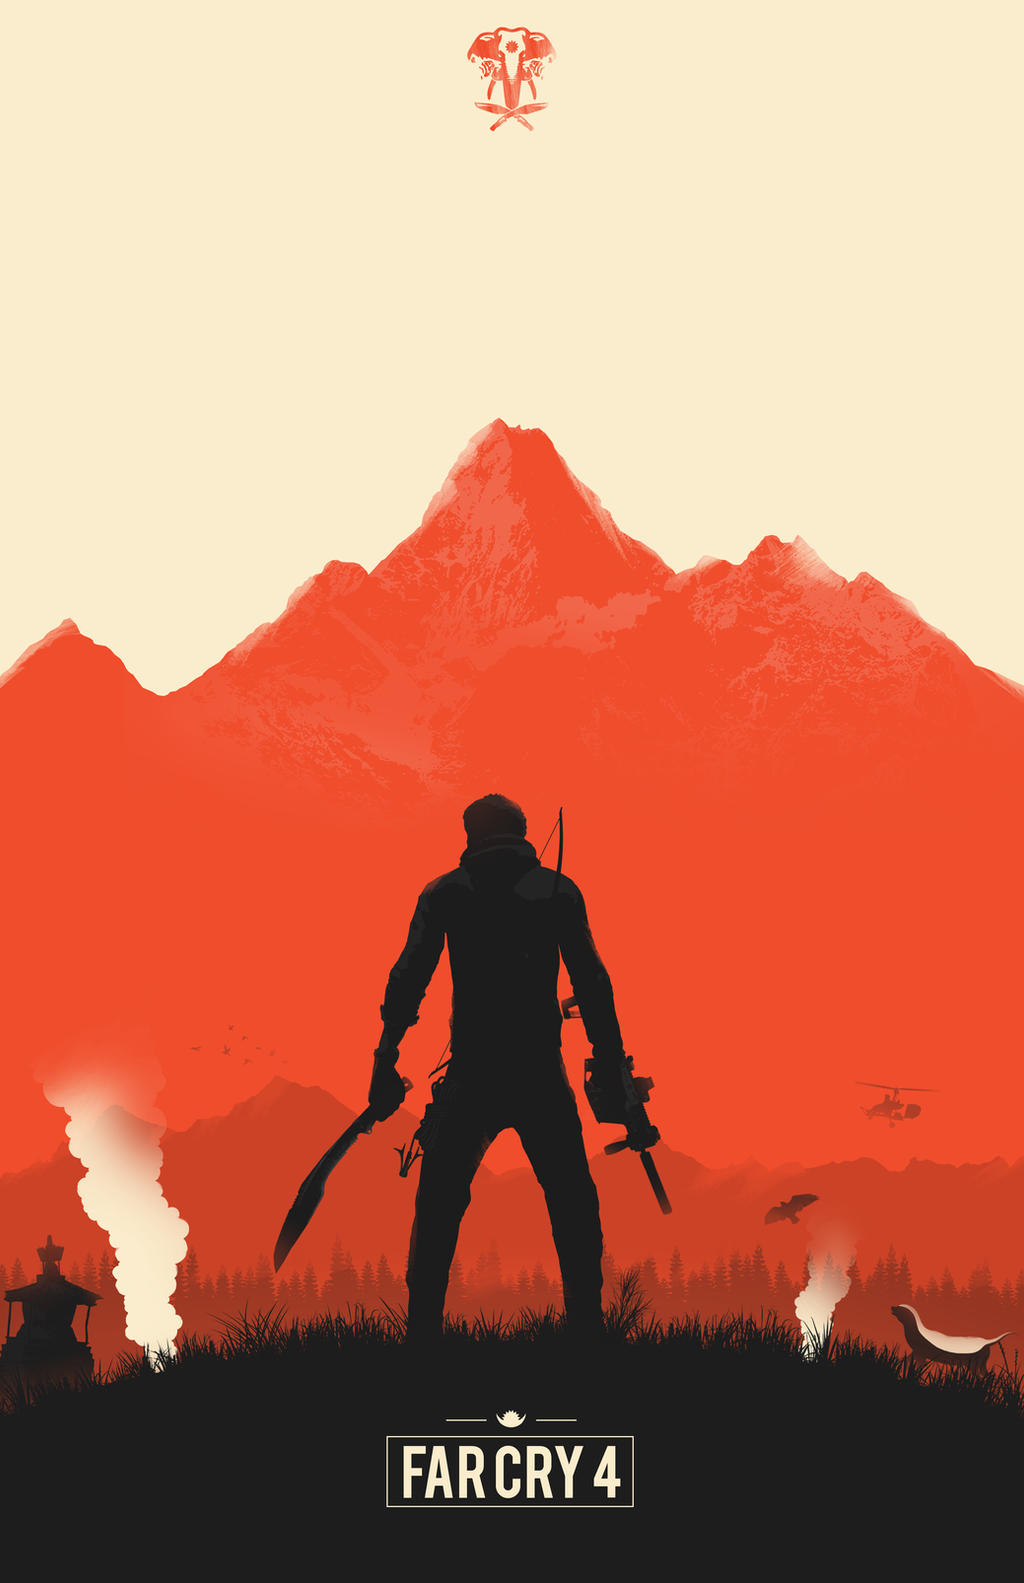 Far Cry 4 by shrimpy99 on DeviantArt